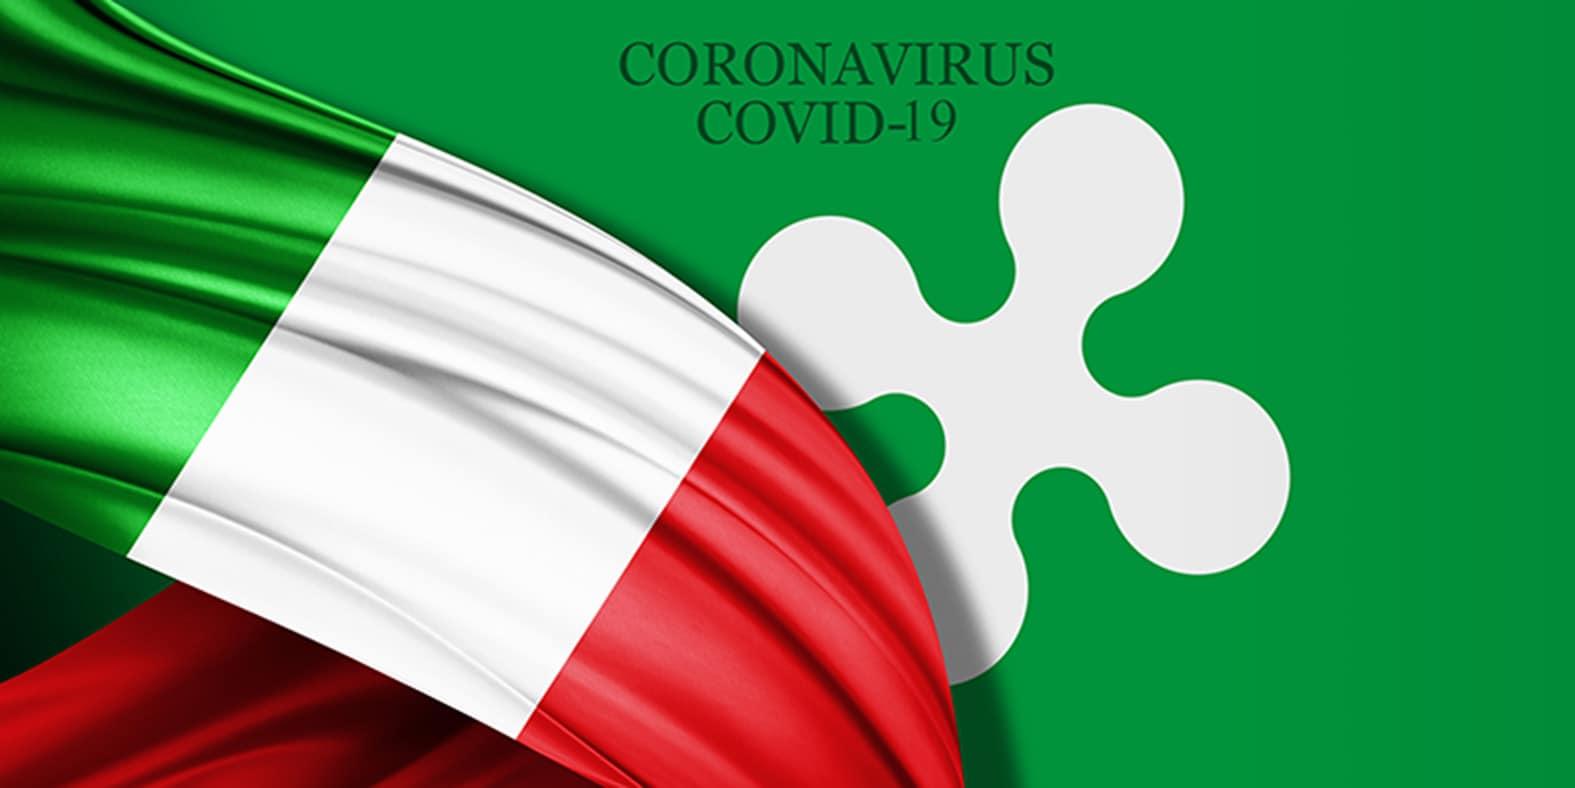 bollettino lombardia coronavirus 19 novembre oggi